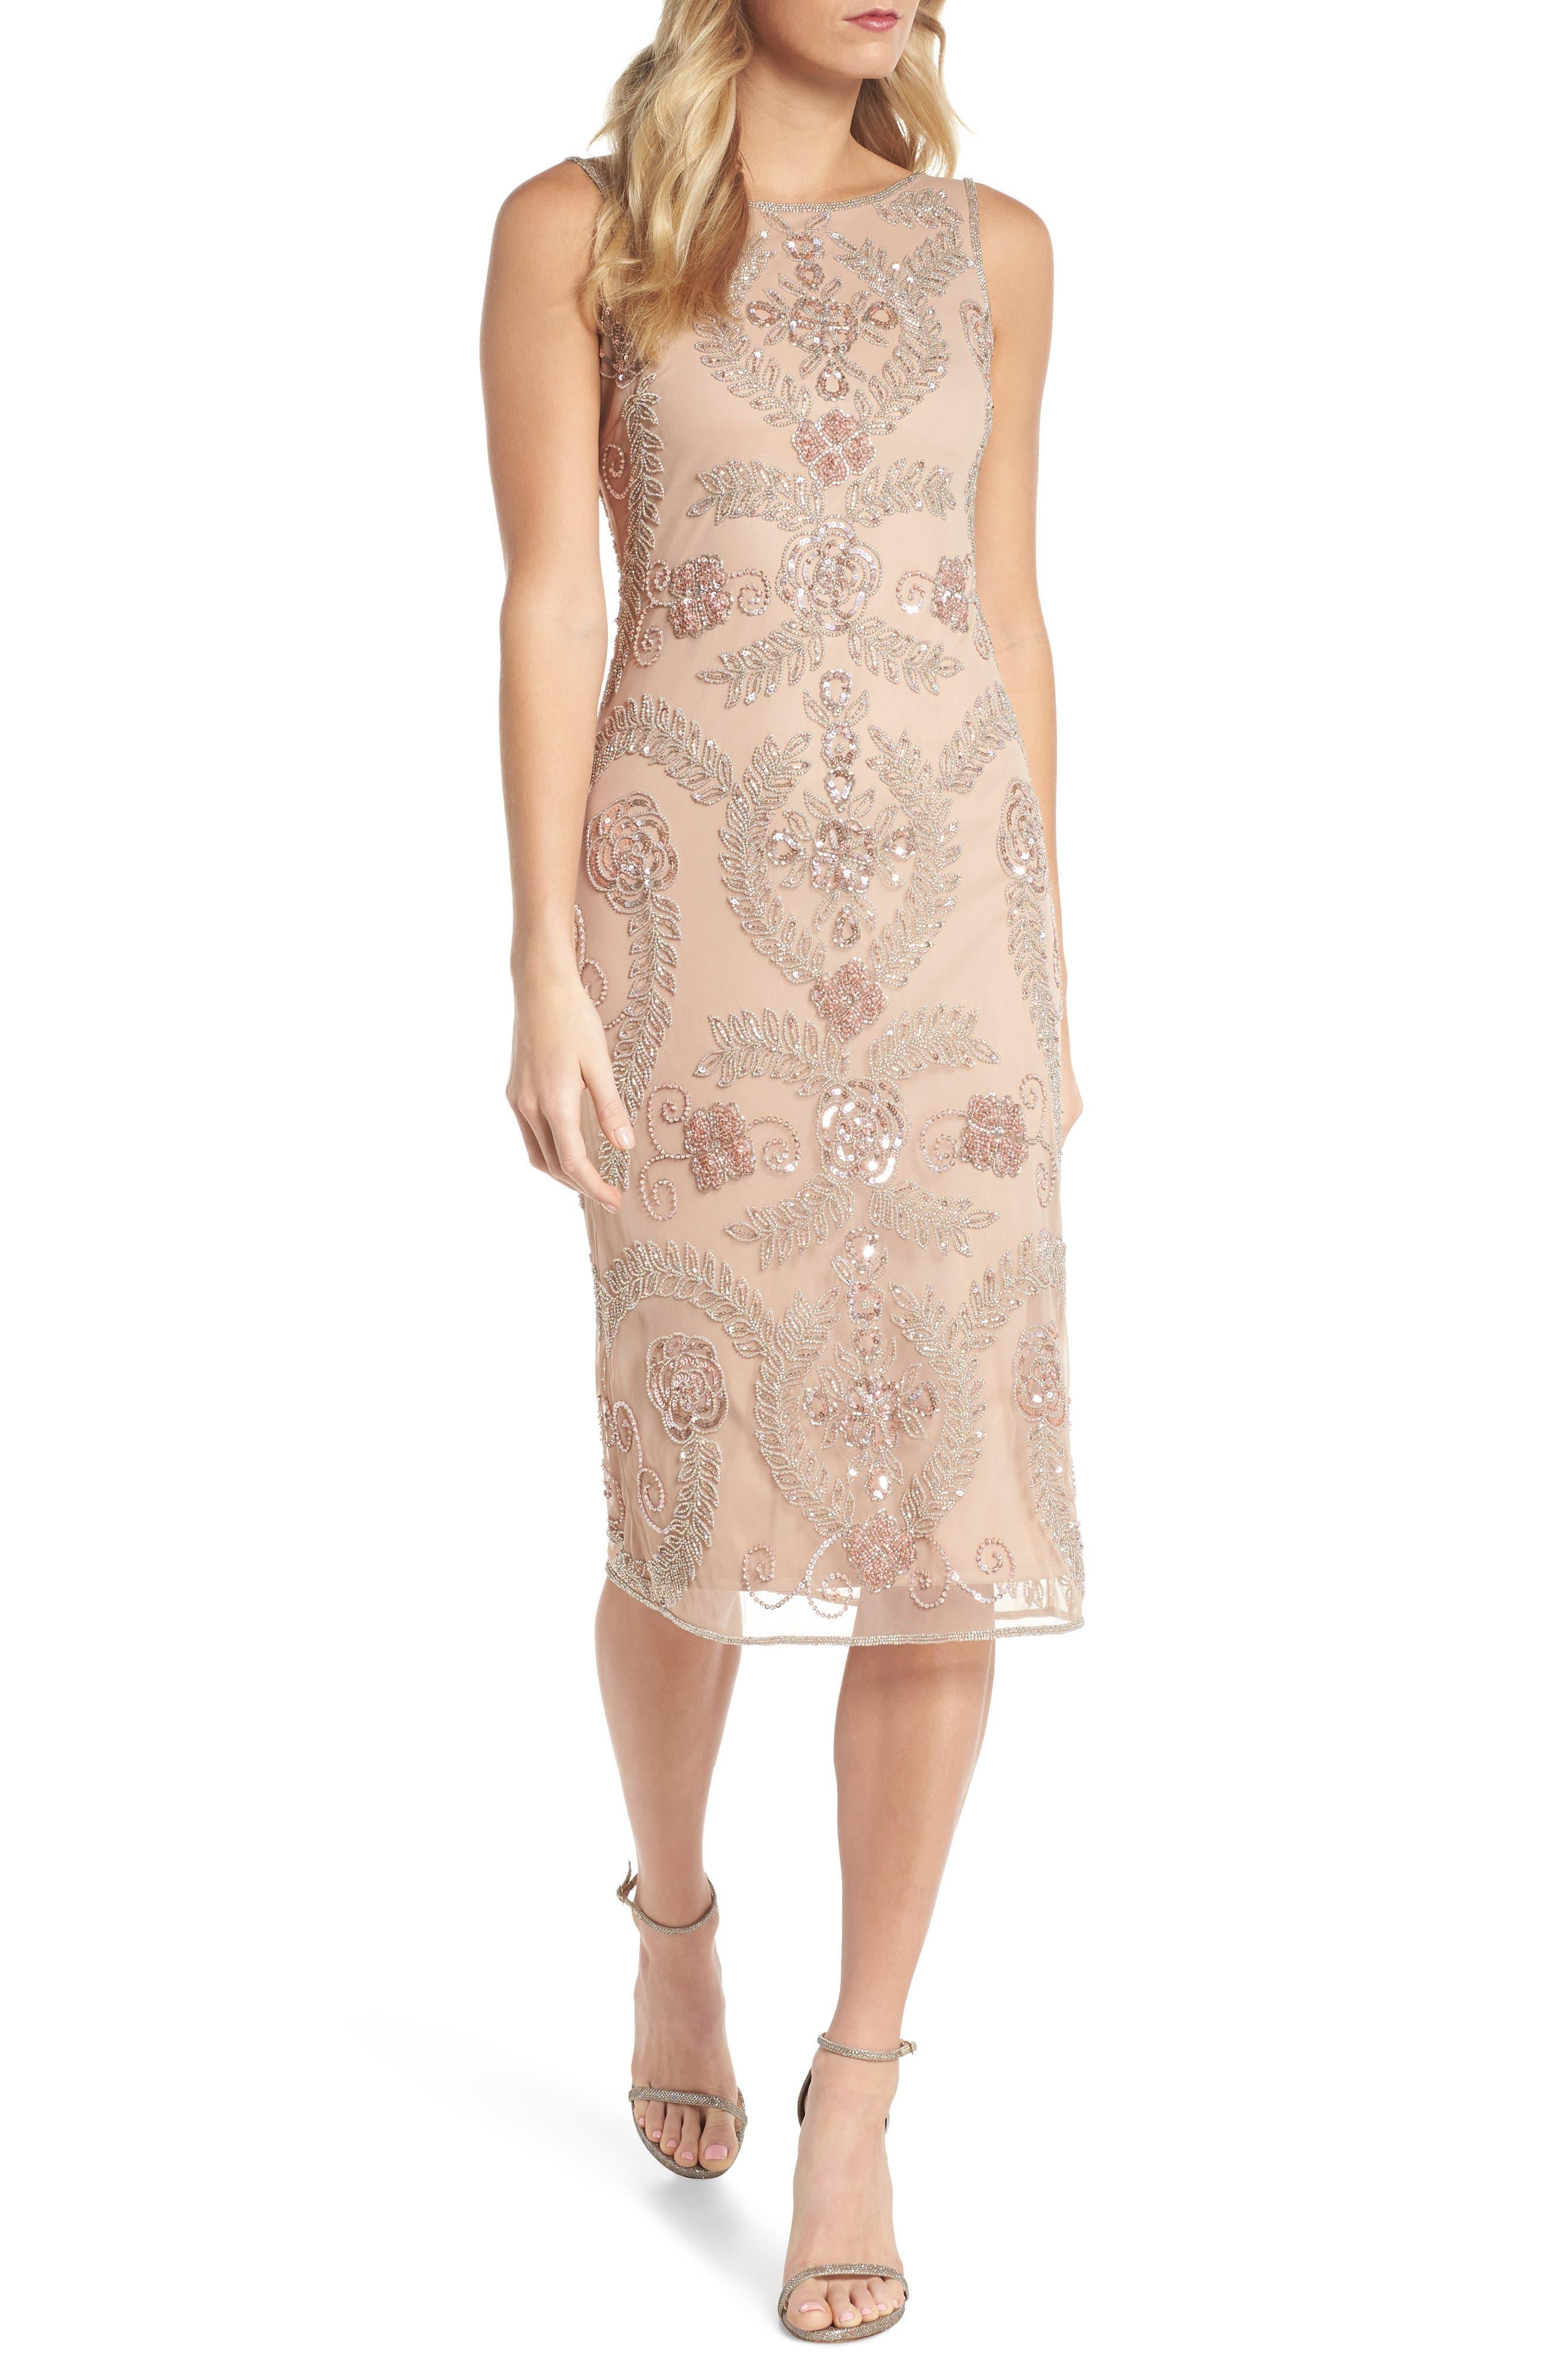 Alternate Image 1 Selected - Pisarro Nights Beaded Pencil Dress (Regular & Petite)